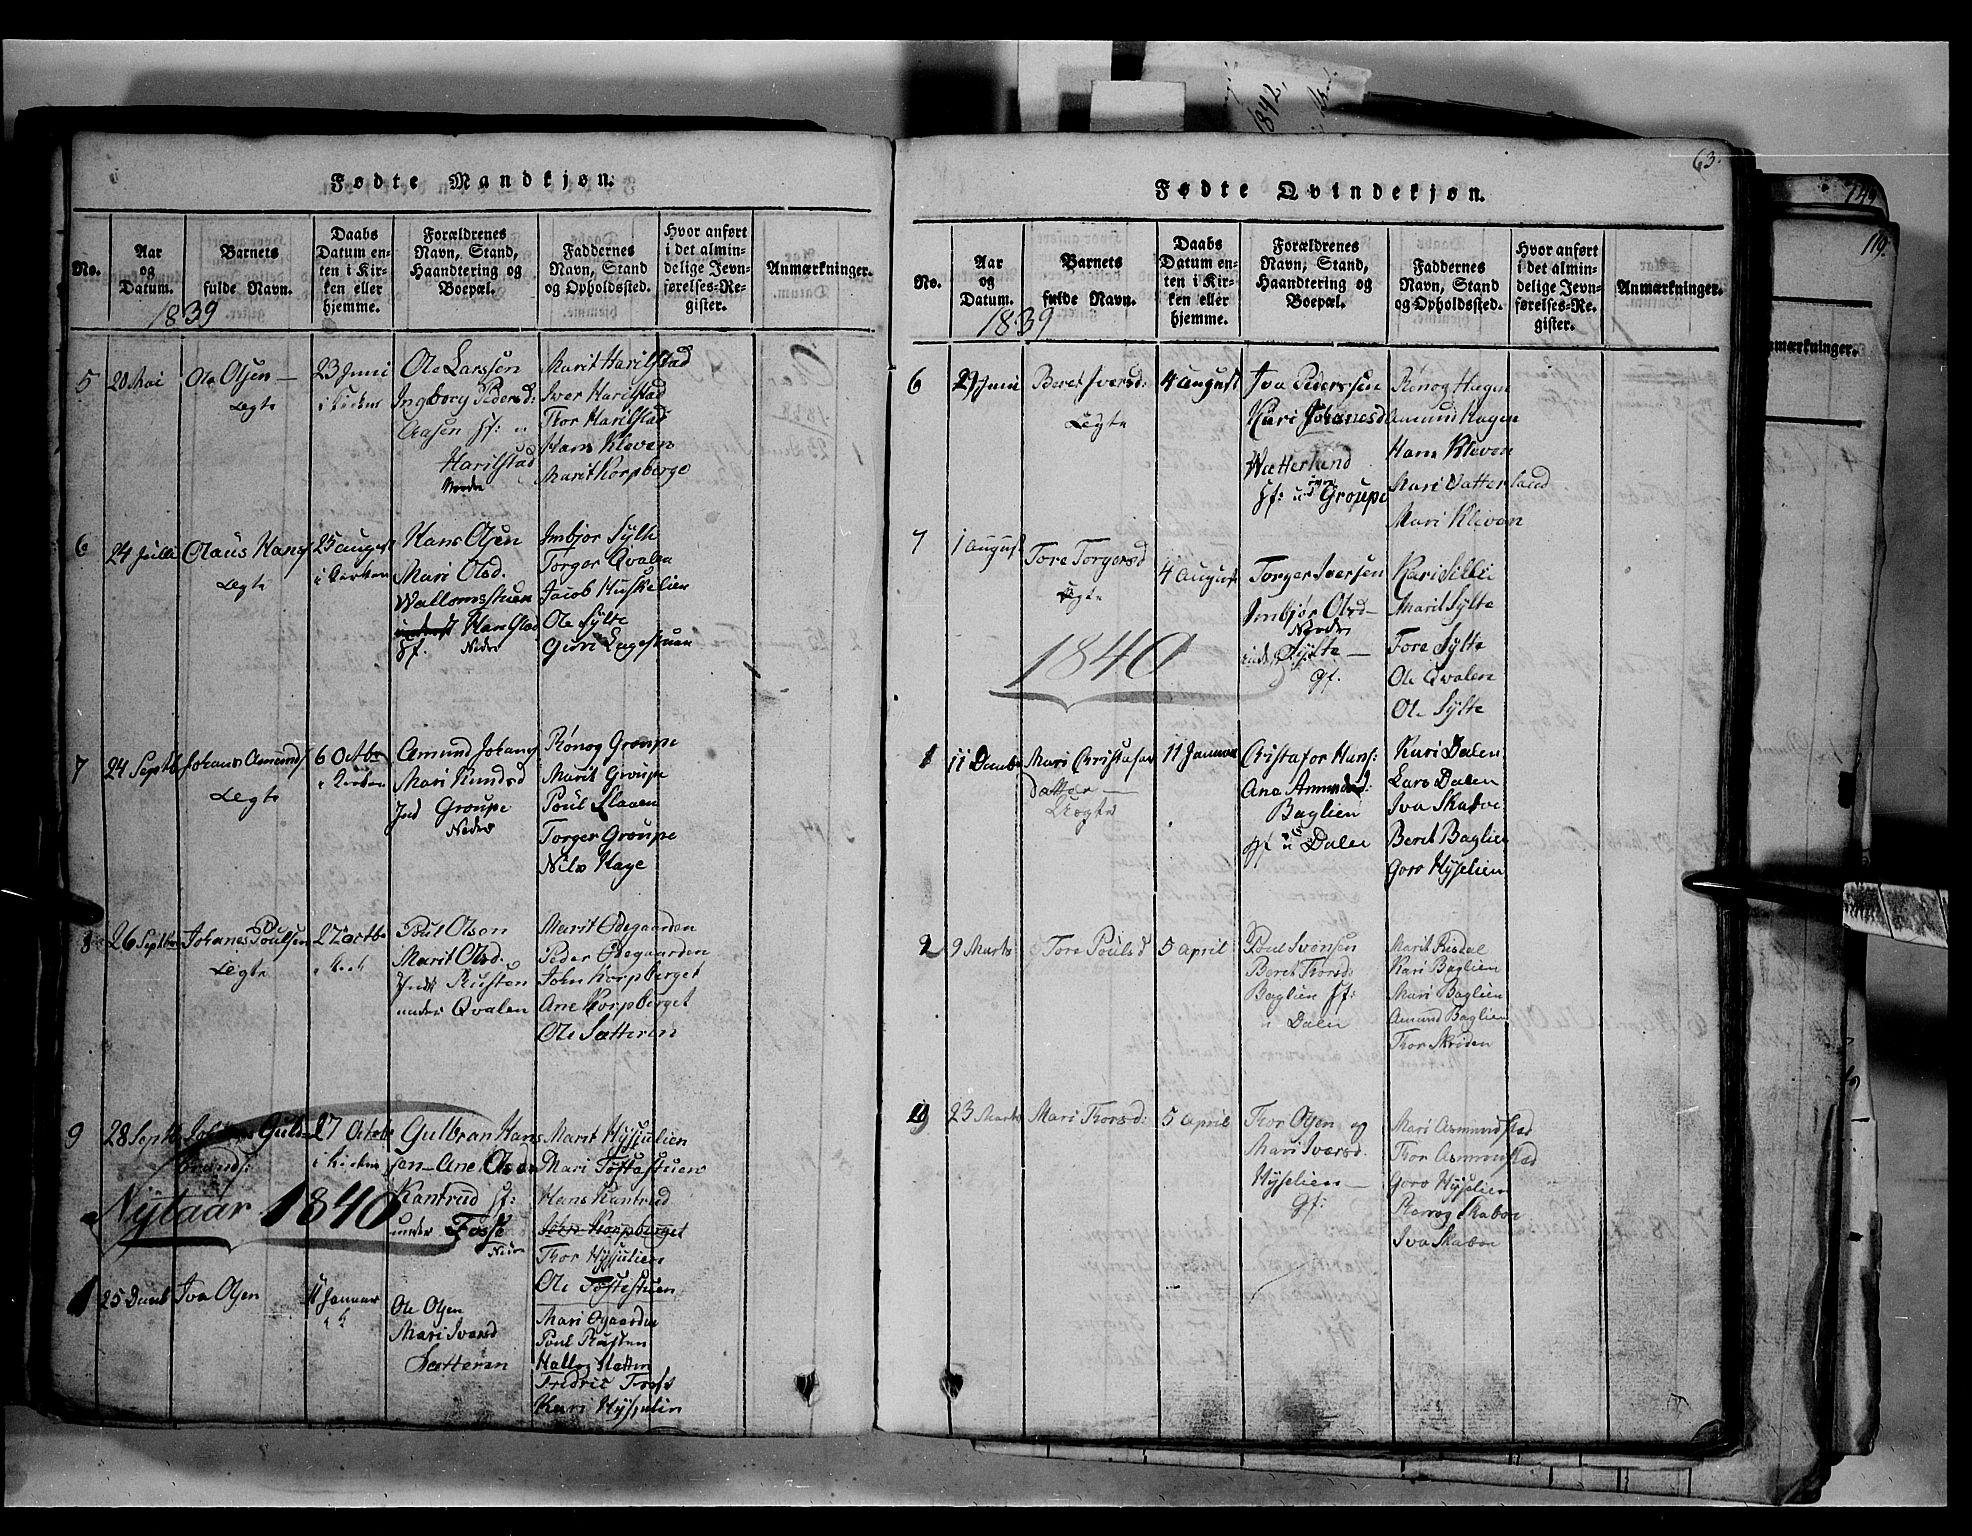 SAH, Fron prestekontor, H/Ha/Hab/L0003: Klokkerbok nr. 3, 1816-1850, s. 63